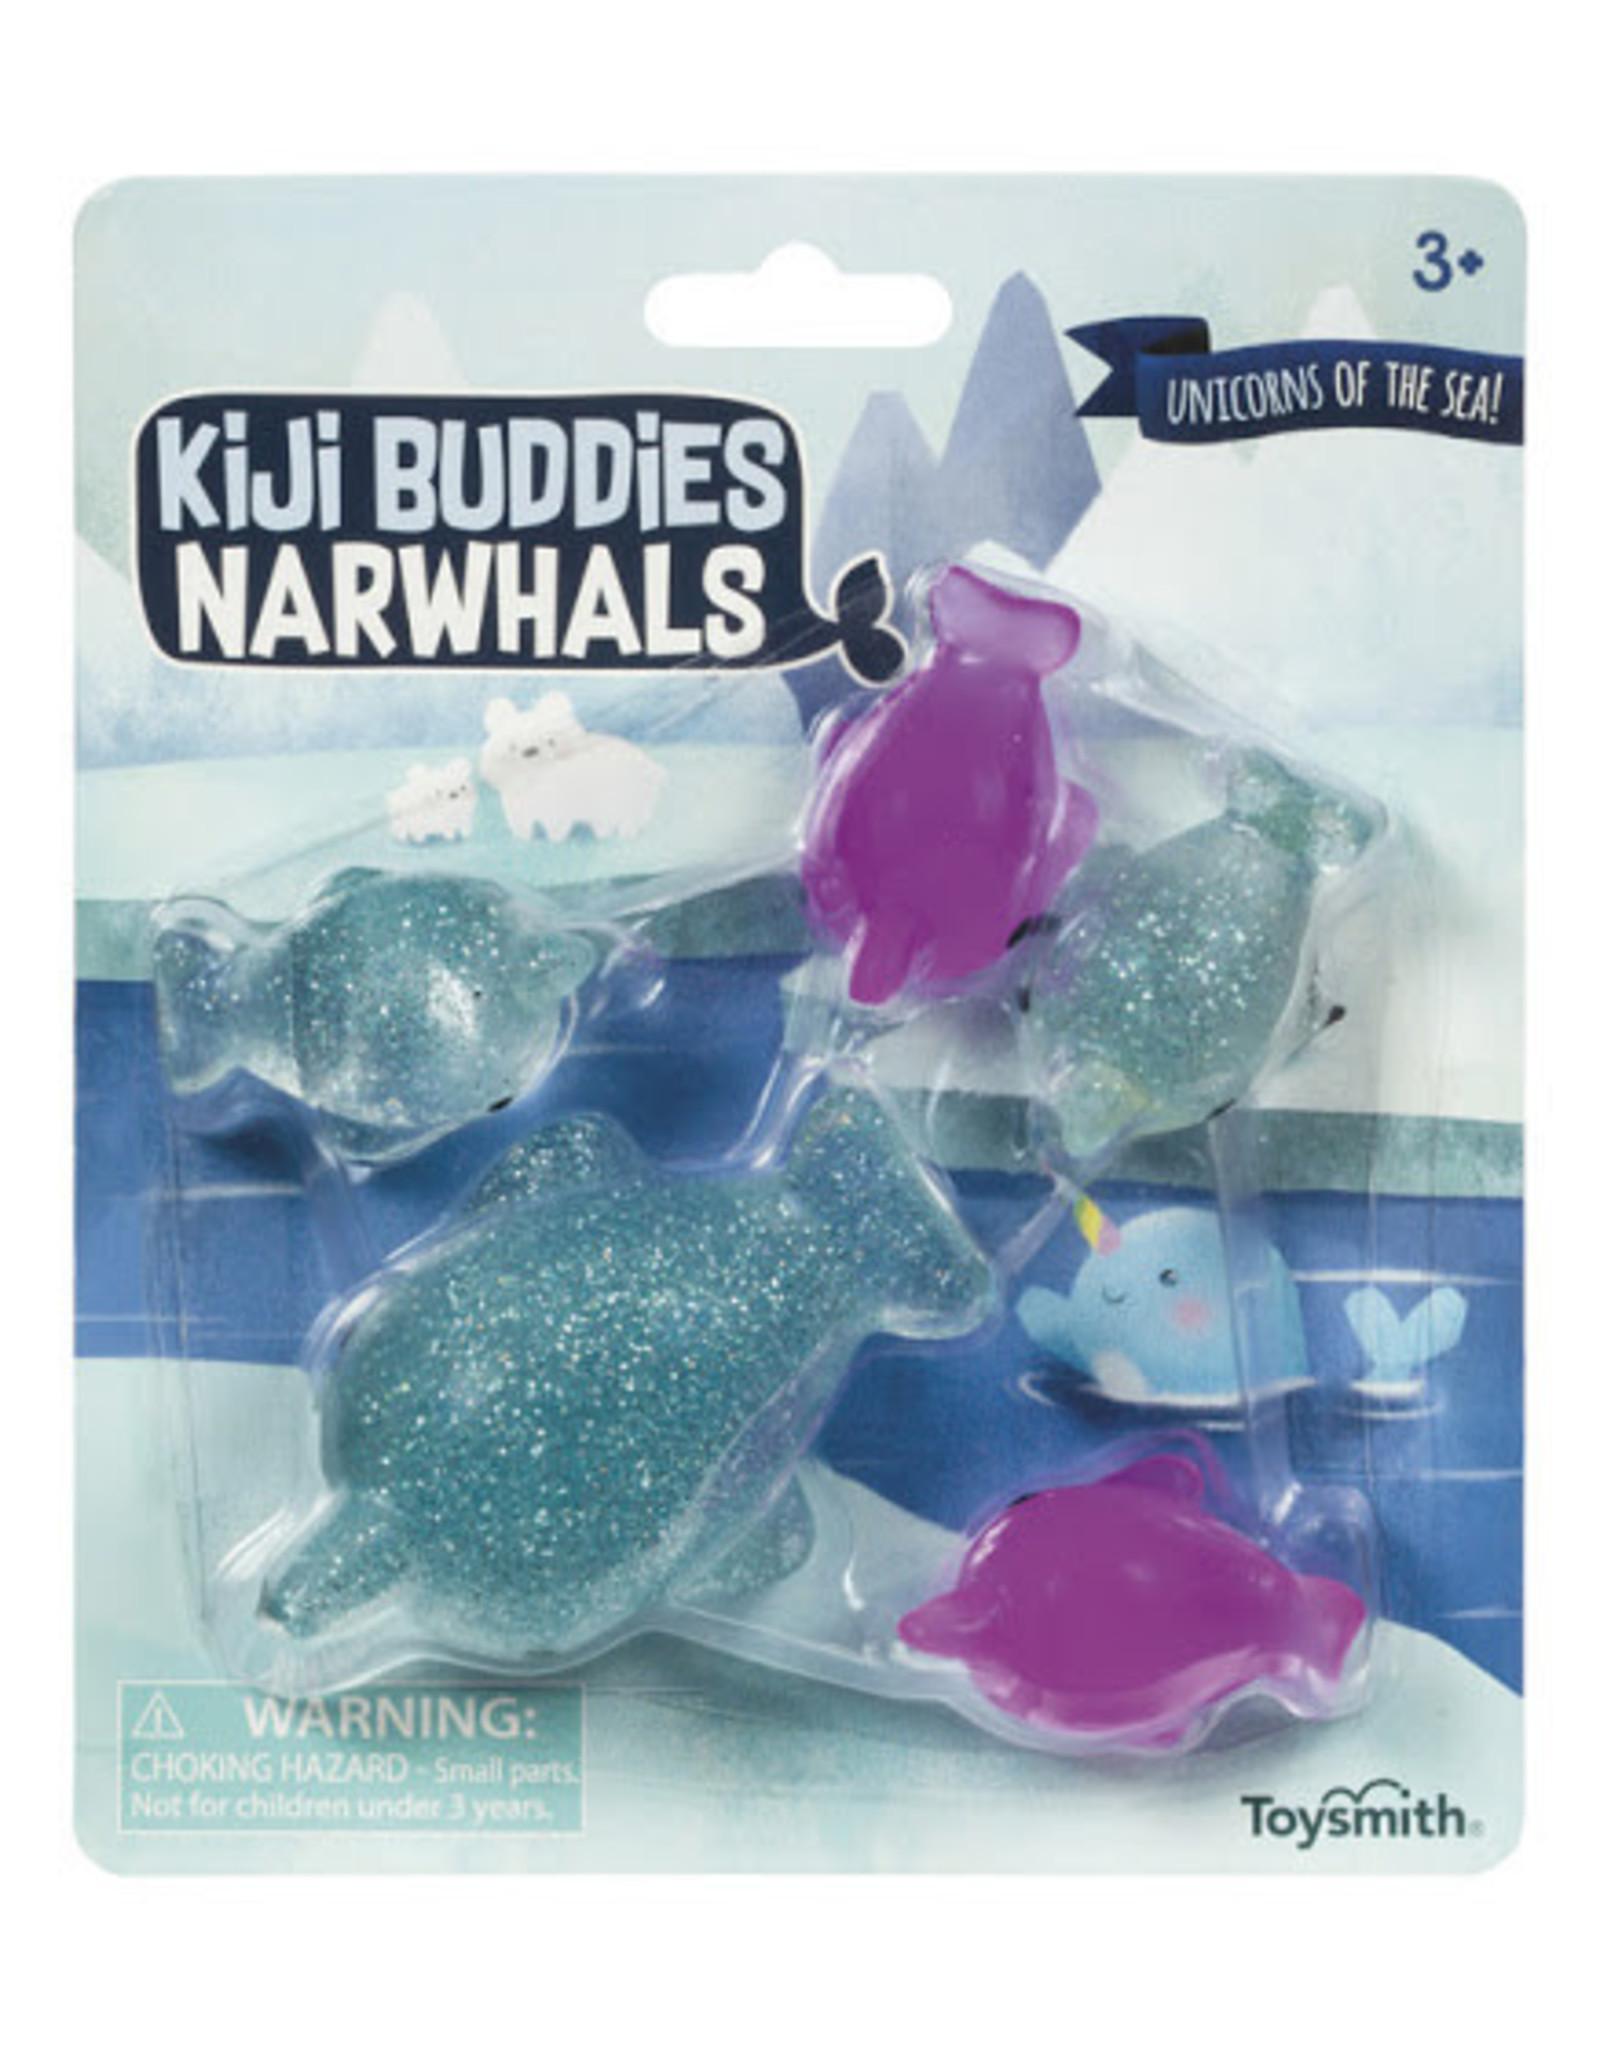 Toysmith Kiji Buddies Narwhals